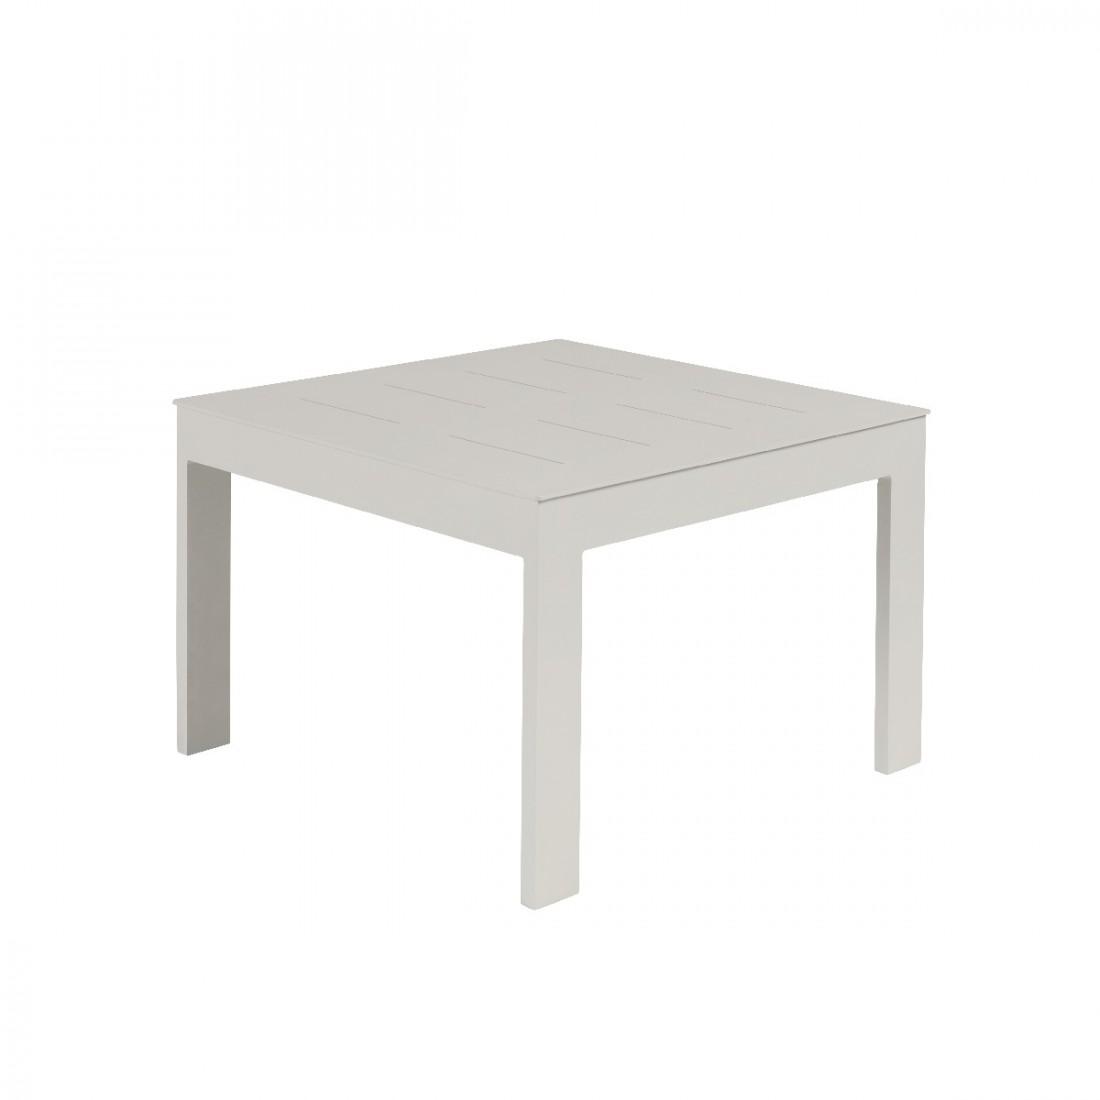 Sienna Smoke White Outdoor Coffee Table